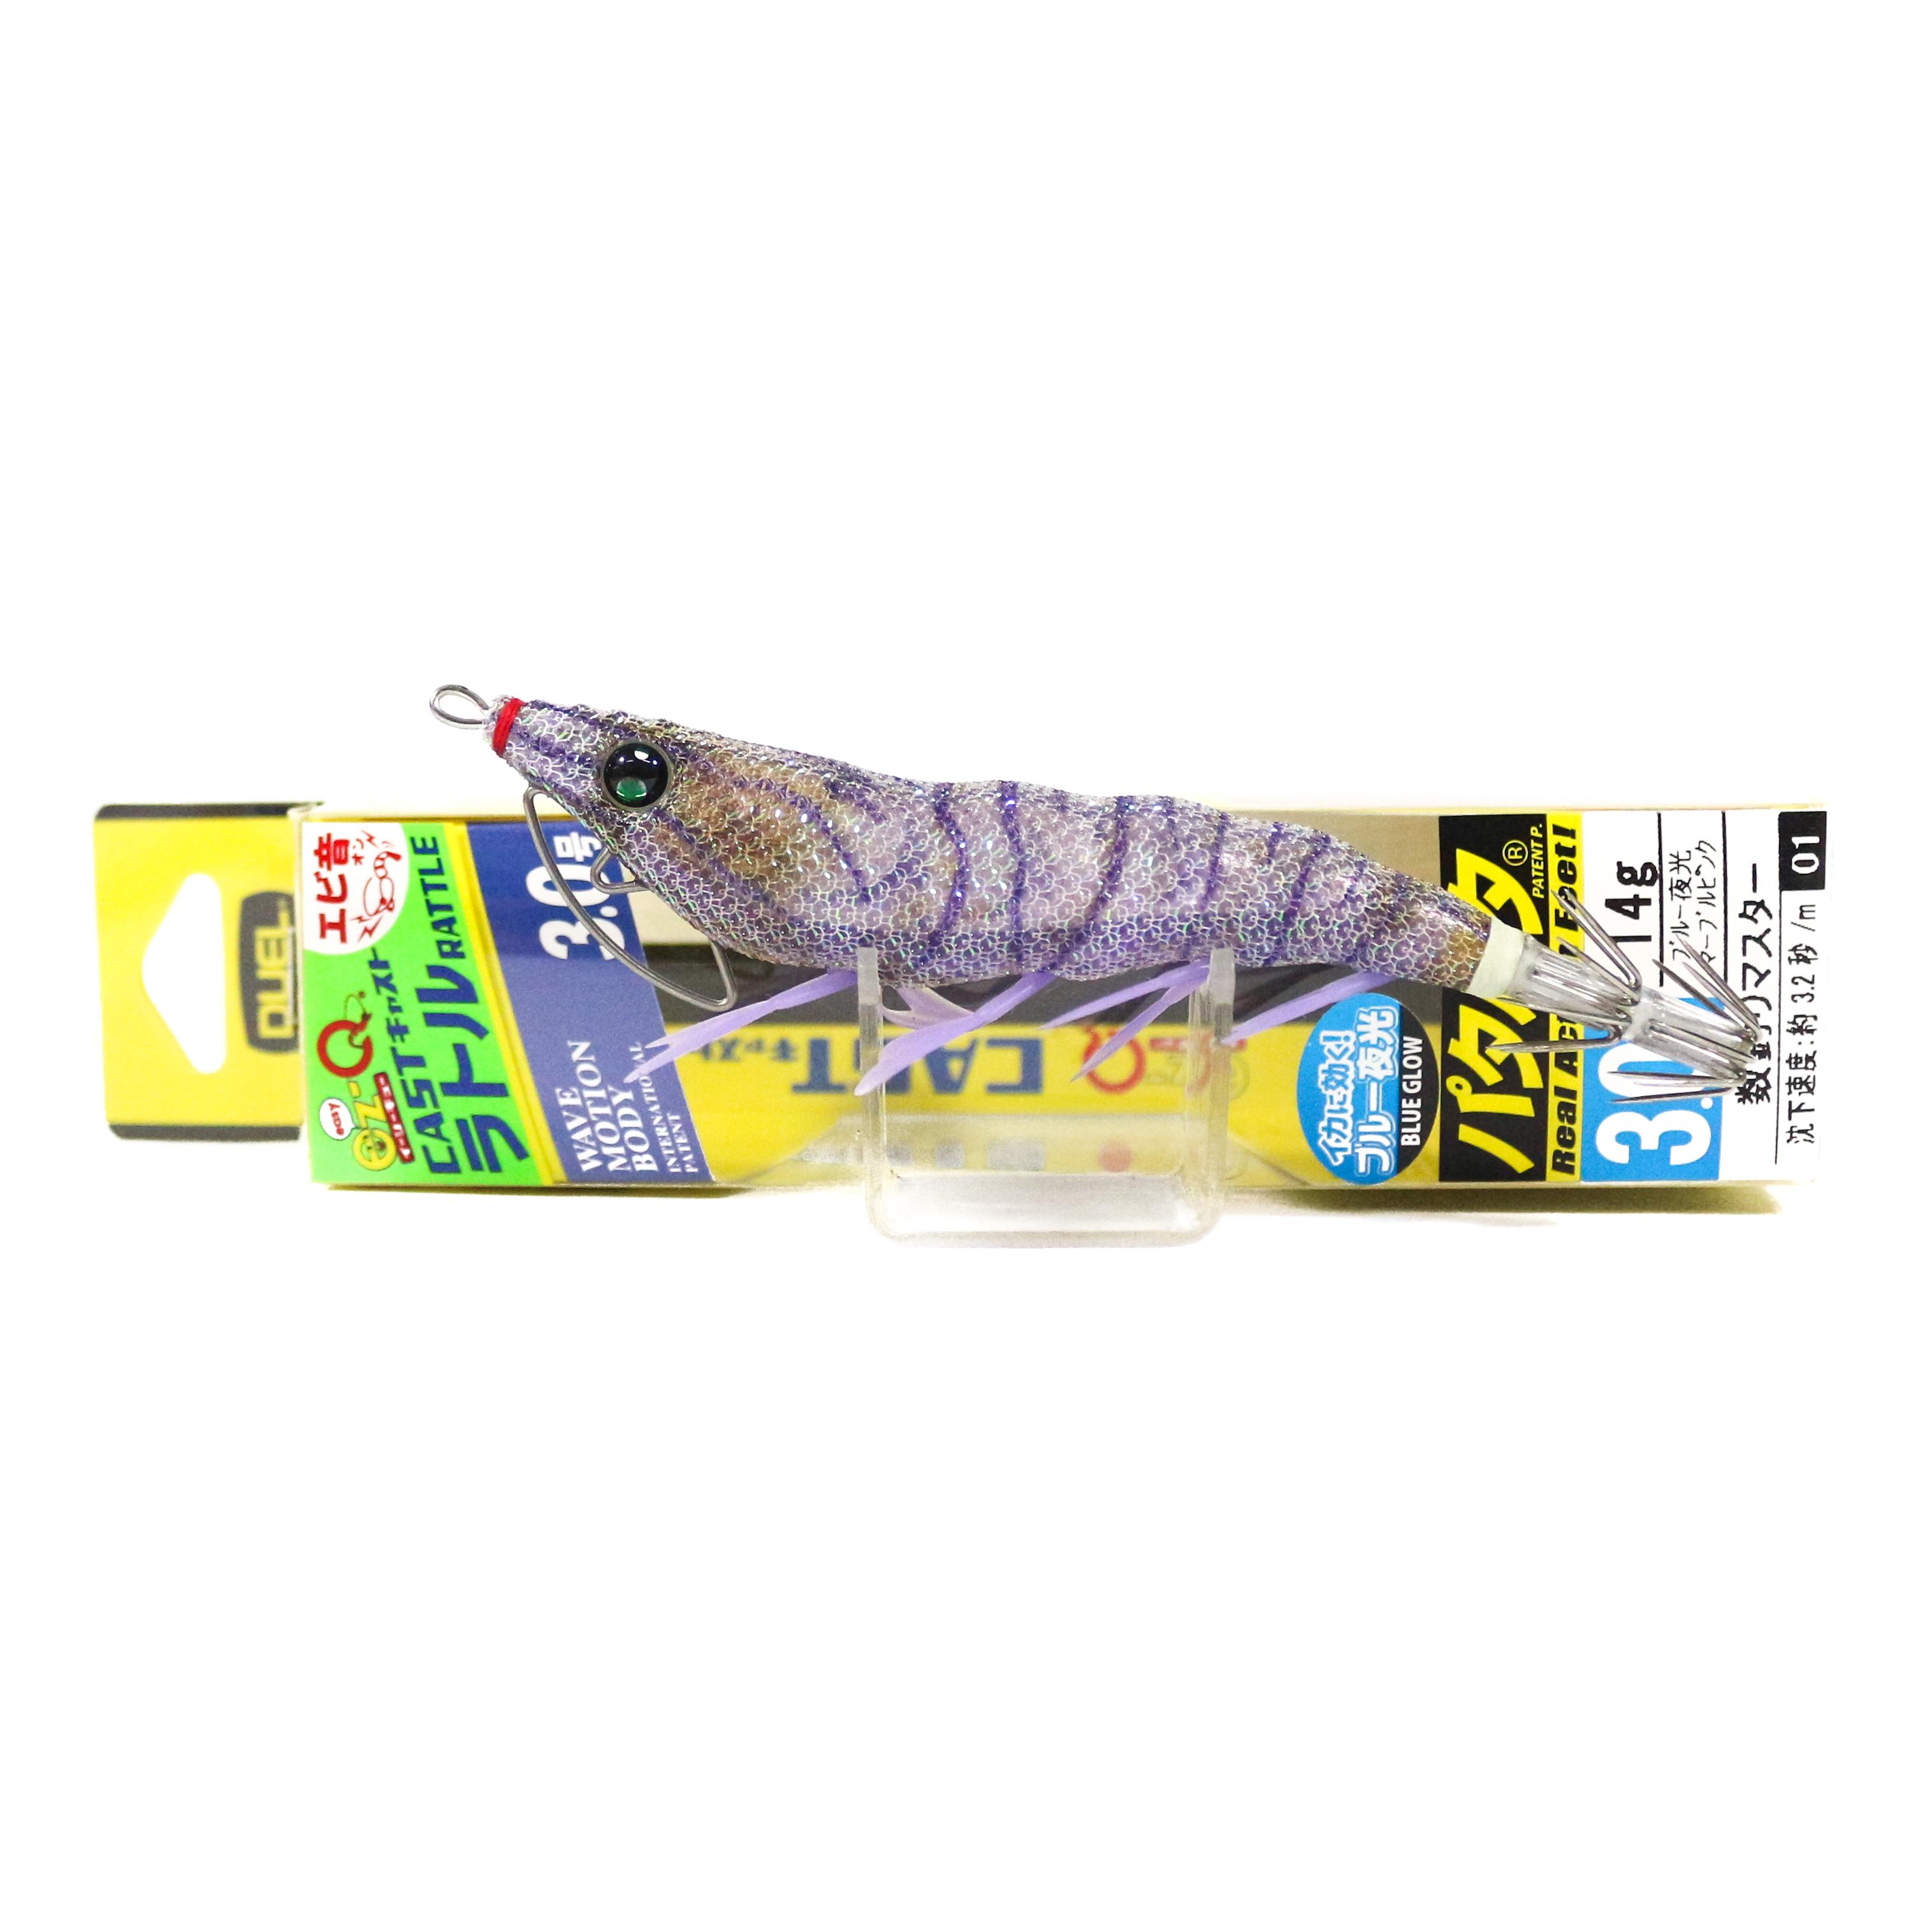 Yo Zuri Duel Egi EZ-Q Cast Rattle Squid Jig Sinking Lure 3.0 A1691-RISE (9475)